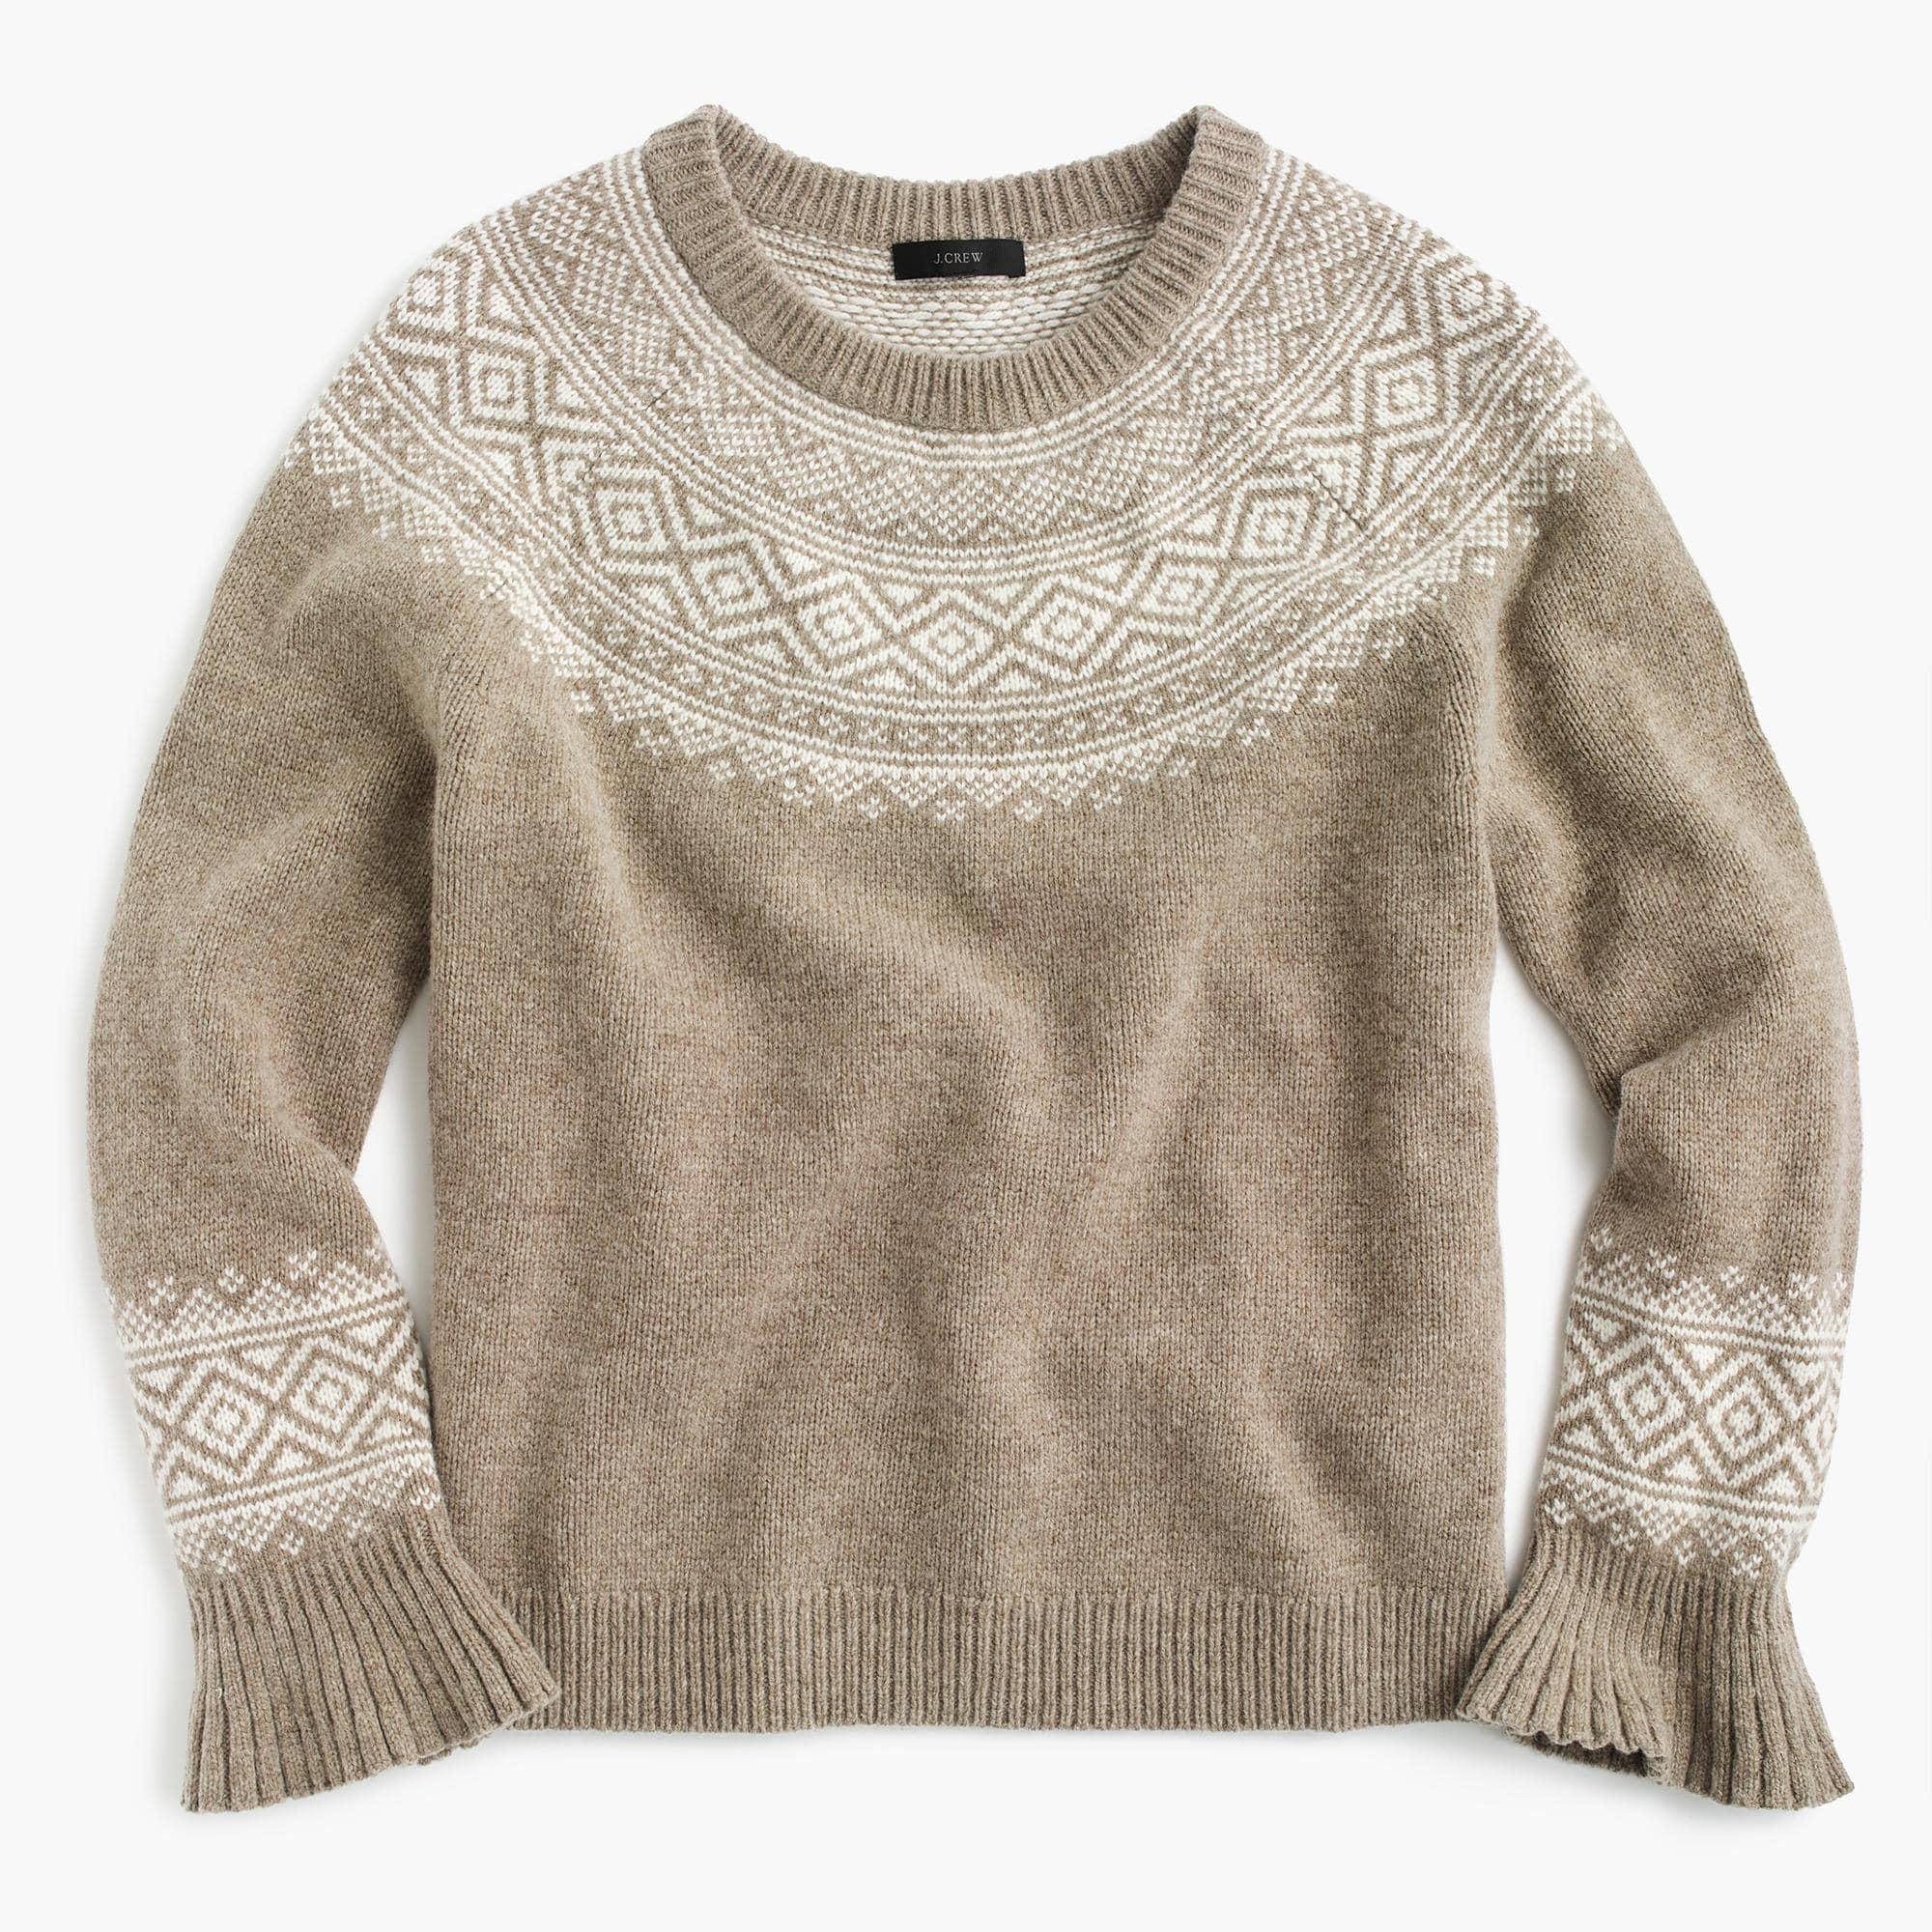 J.crew Fair Isle Ruffle-sleeve Sweater | Lyst